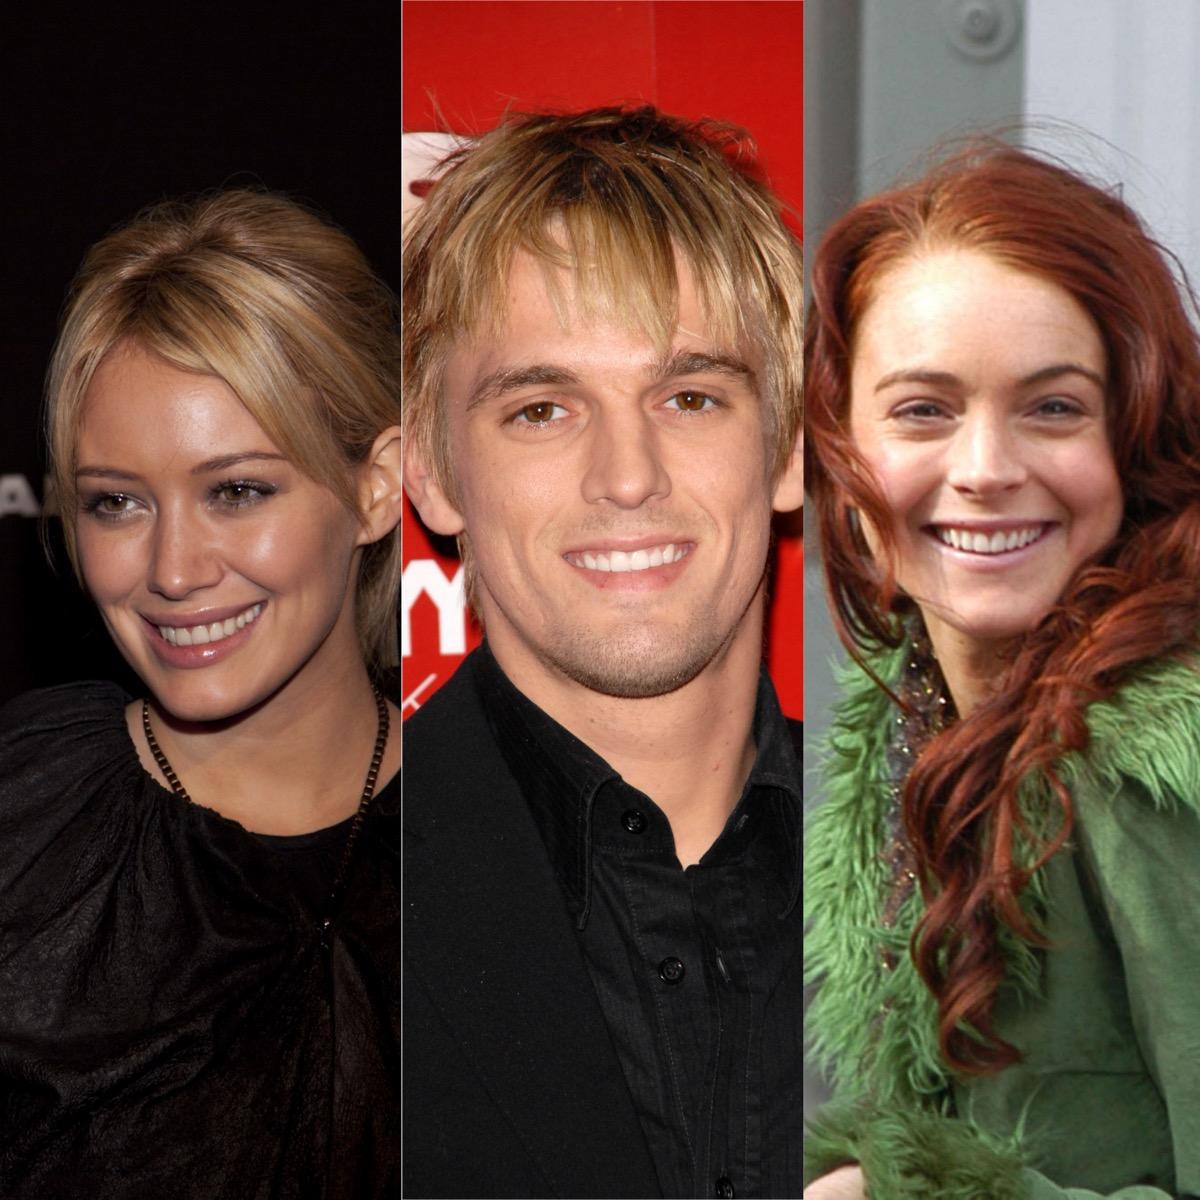 Hilary Duff, Aaron Carter, and Lindsay Lohan